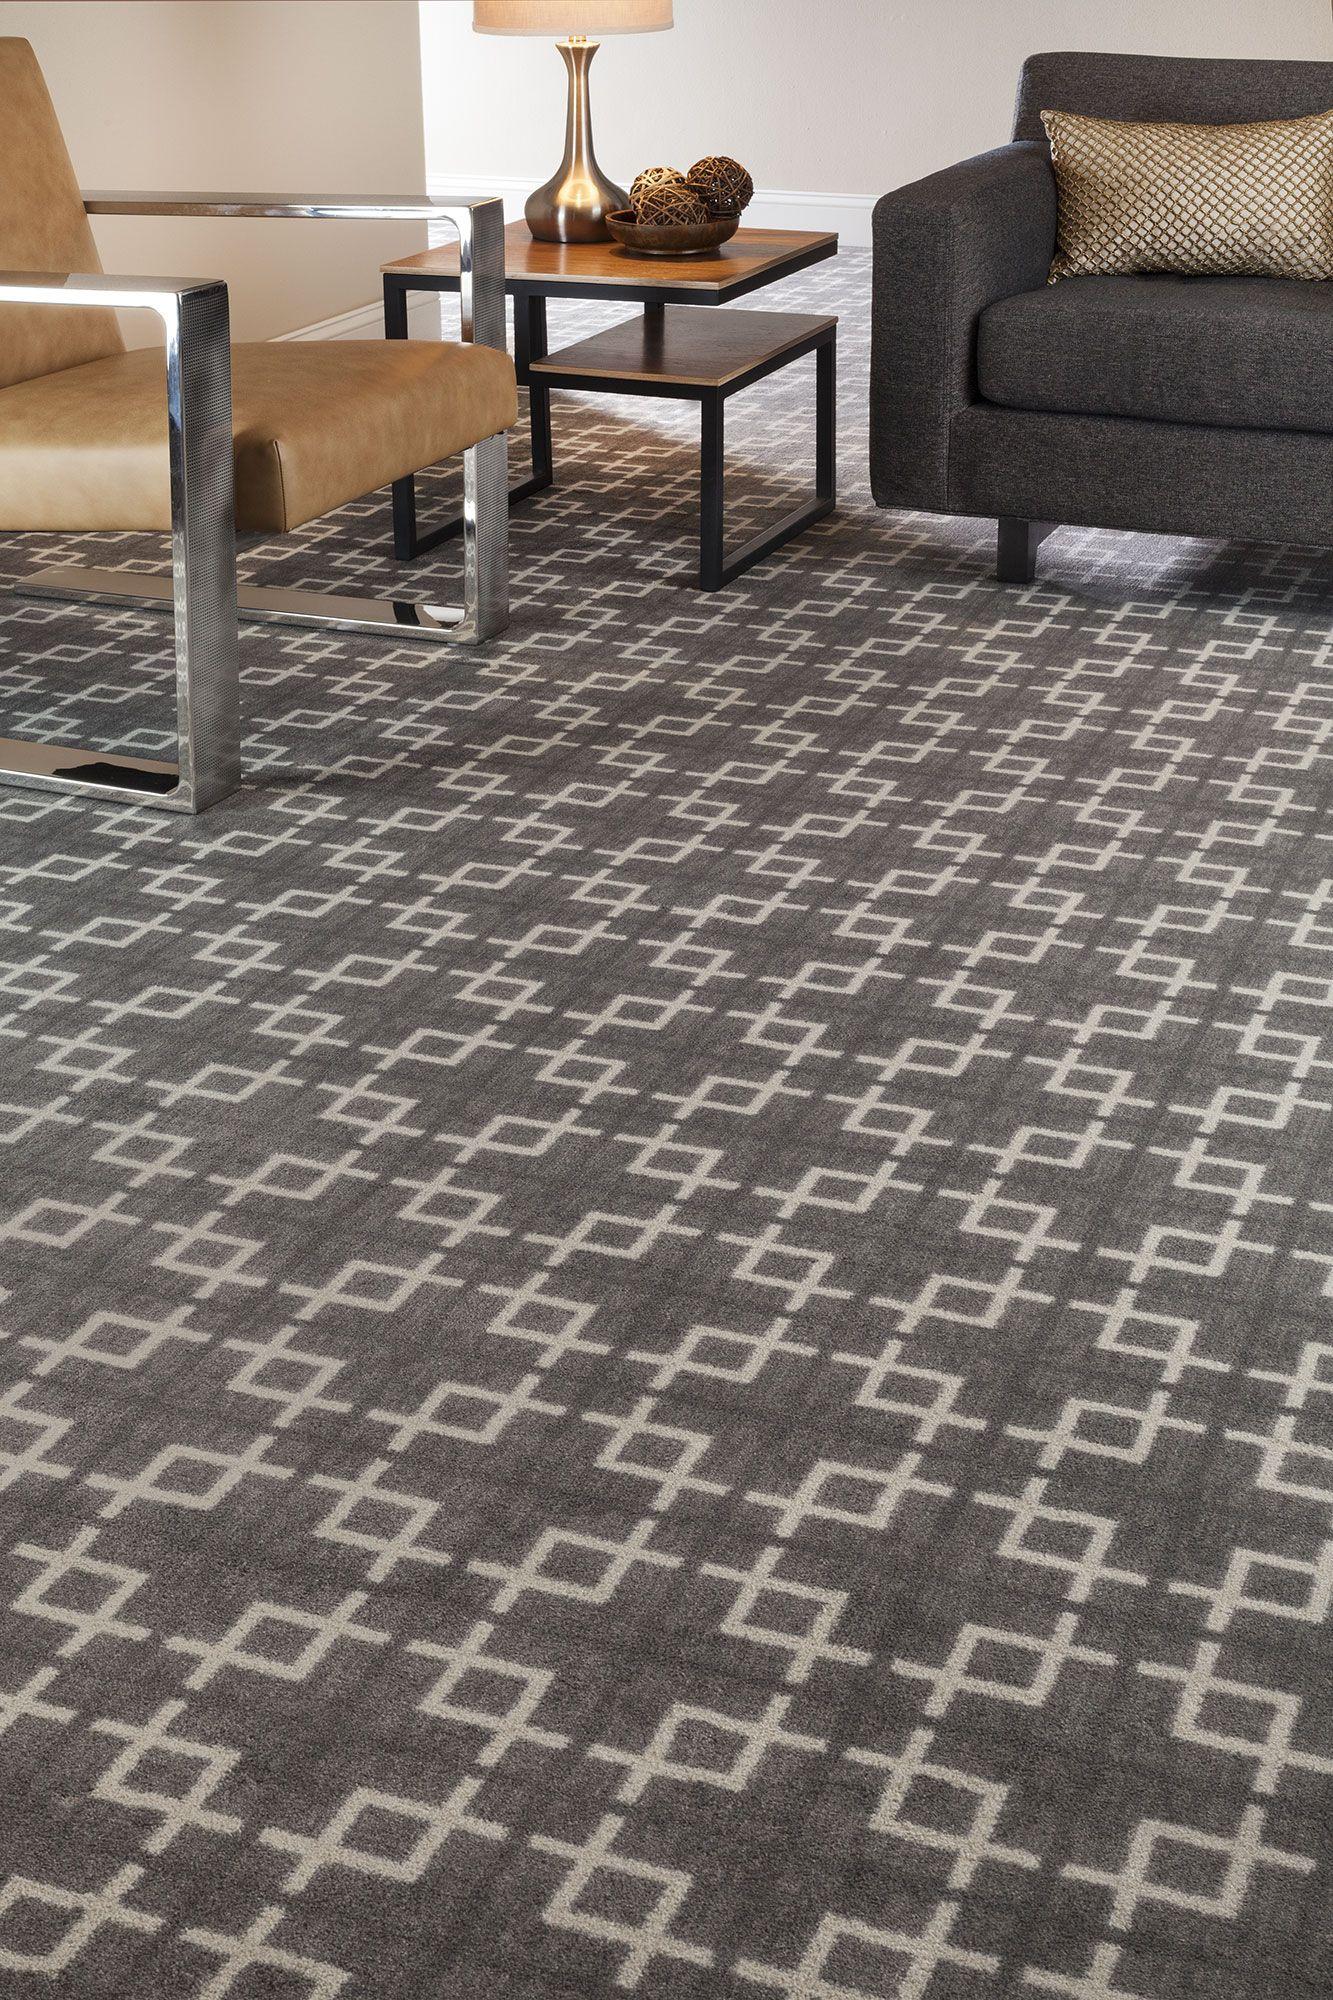 Geometric Patterned Carpet | Gray & Cream | Home Office Ideas ...